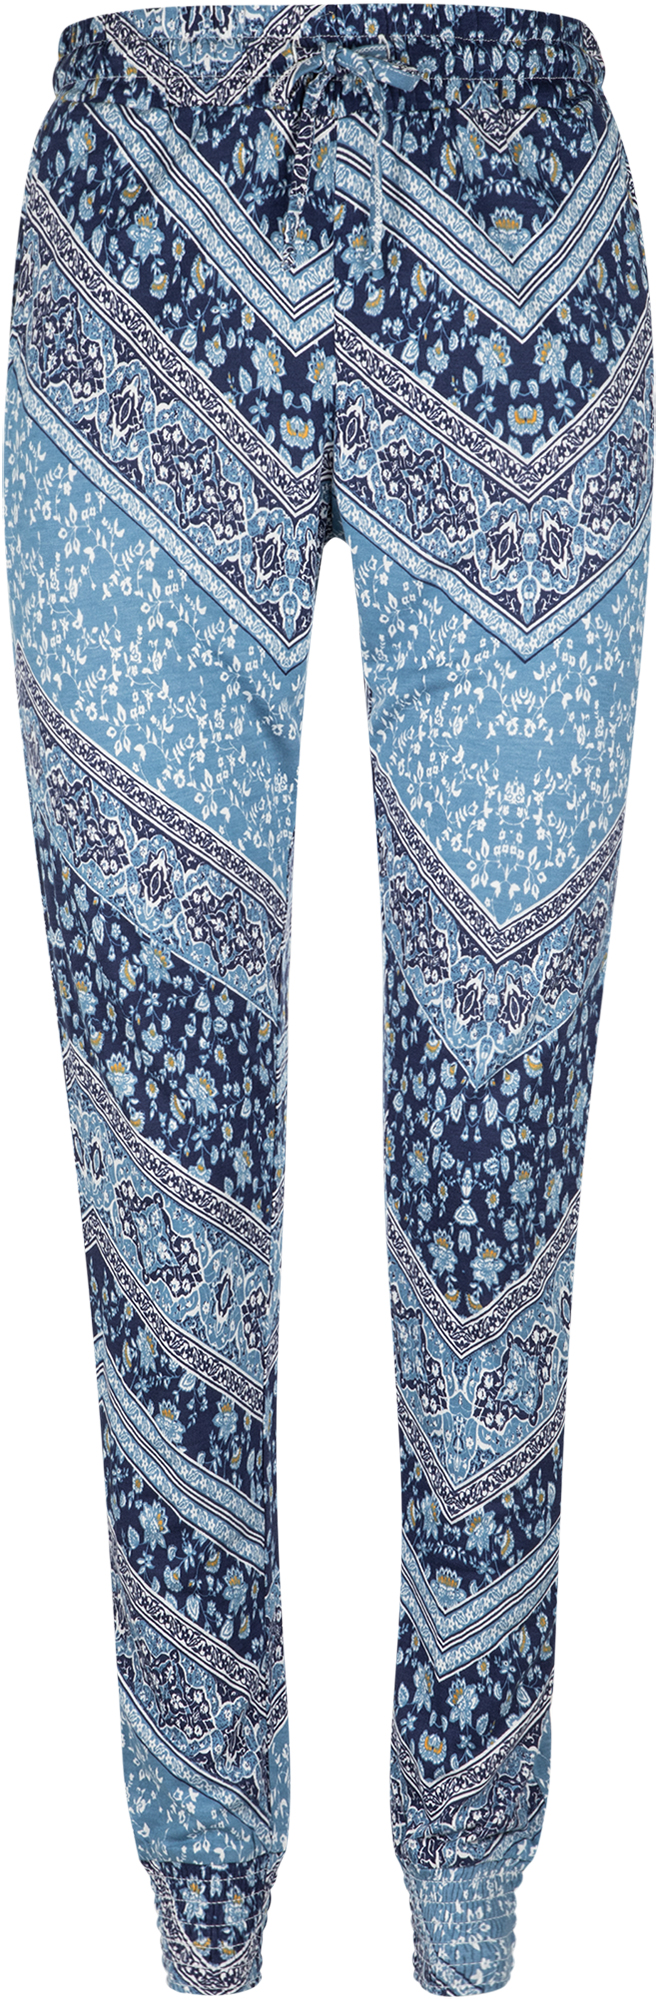 O'Neill Брюки женские O'Neill Printed Beach, размер 52-54 mandala floral printed tasseled tablecloth round beach towel